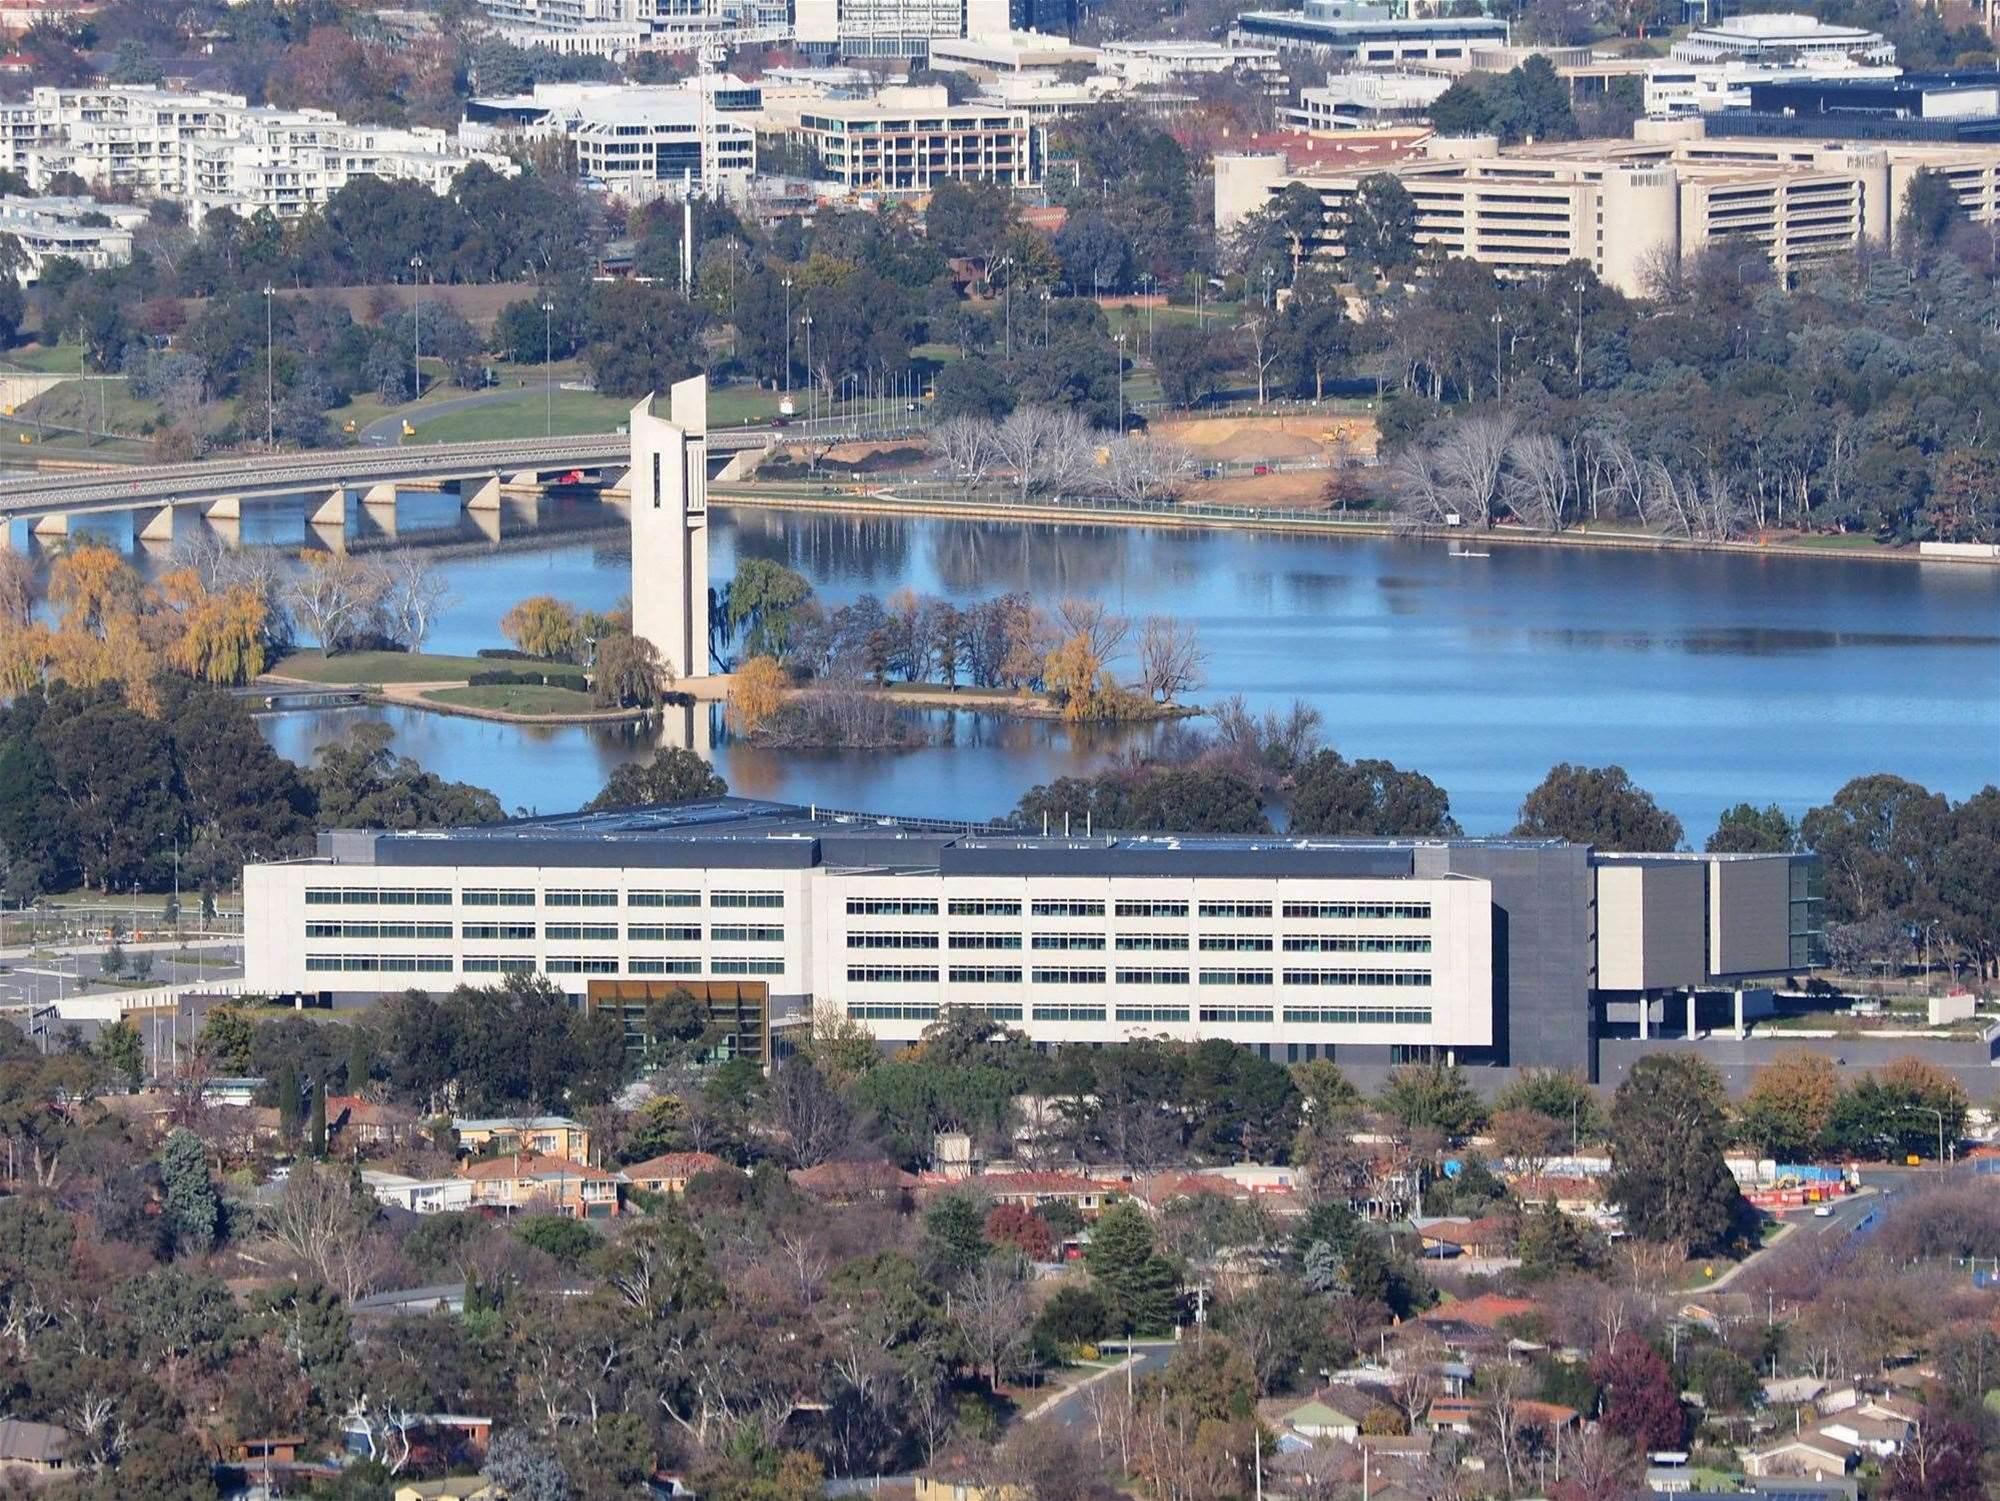 ASD staff move into Australia's new security hub